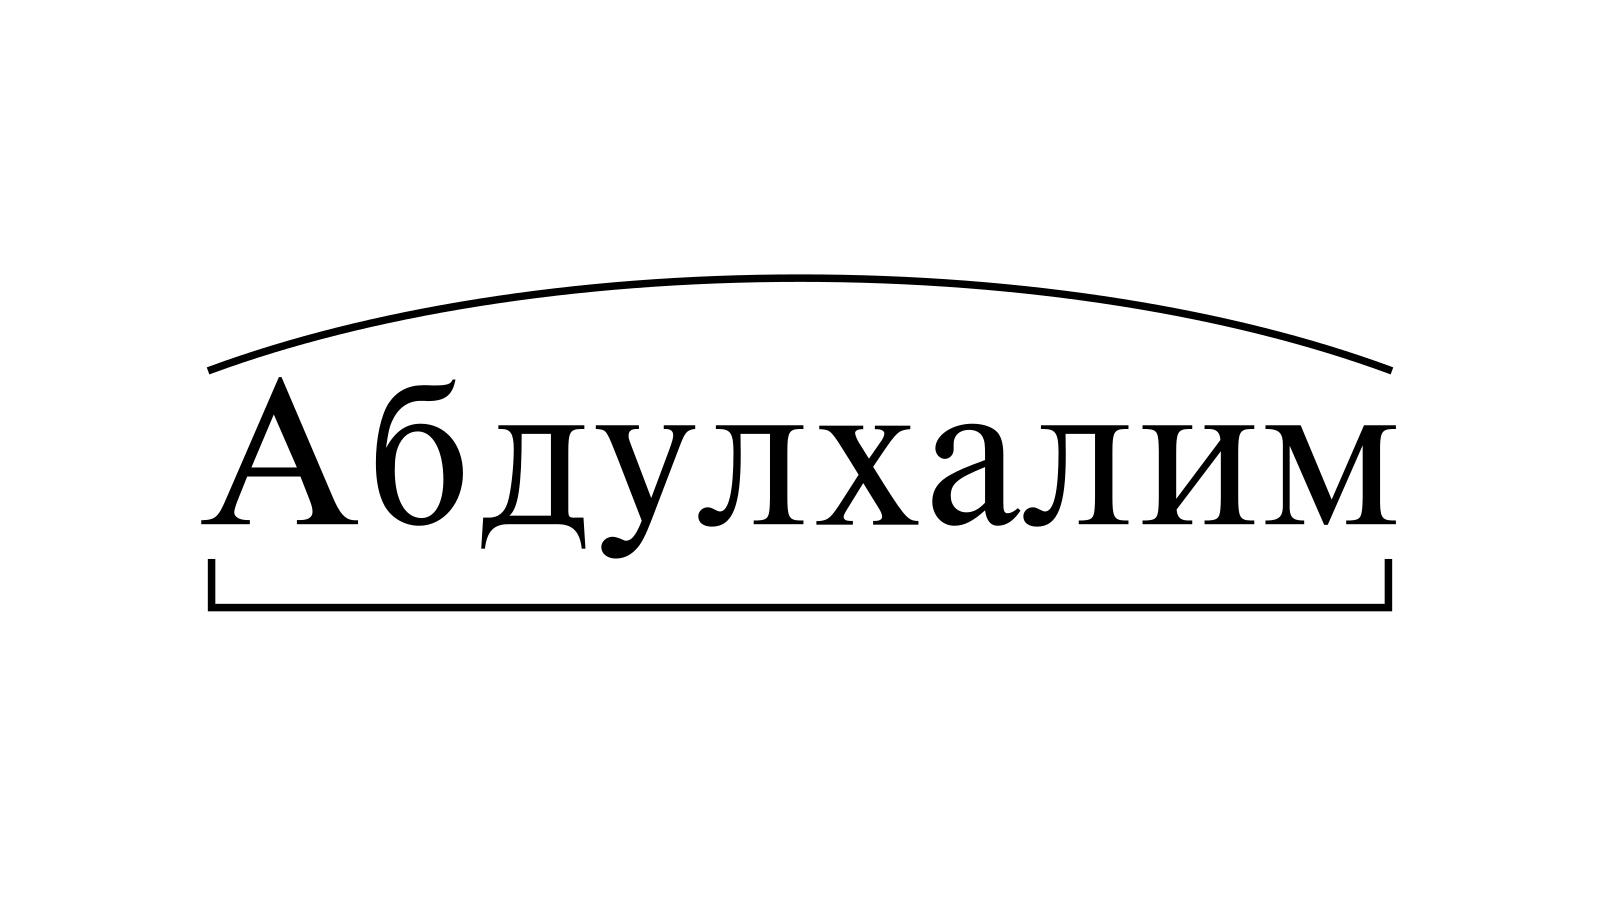 Разбор слова «Абдулхалим» по составу